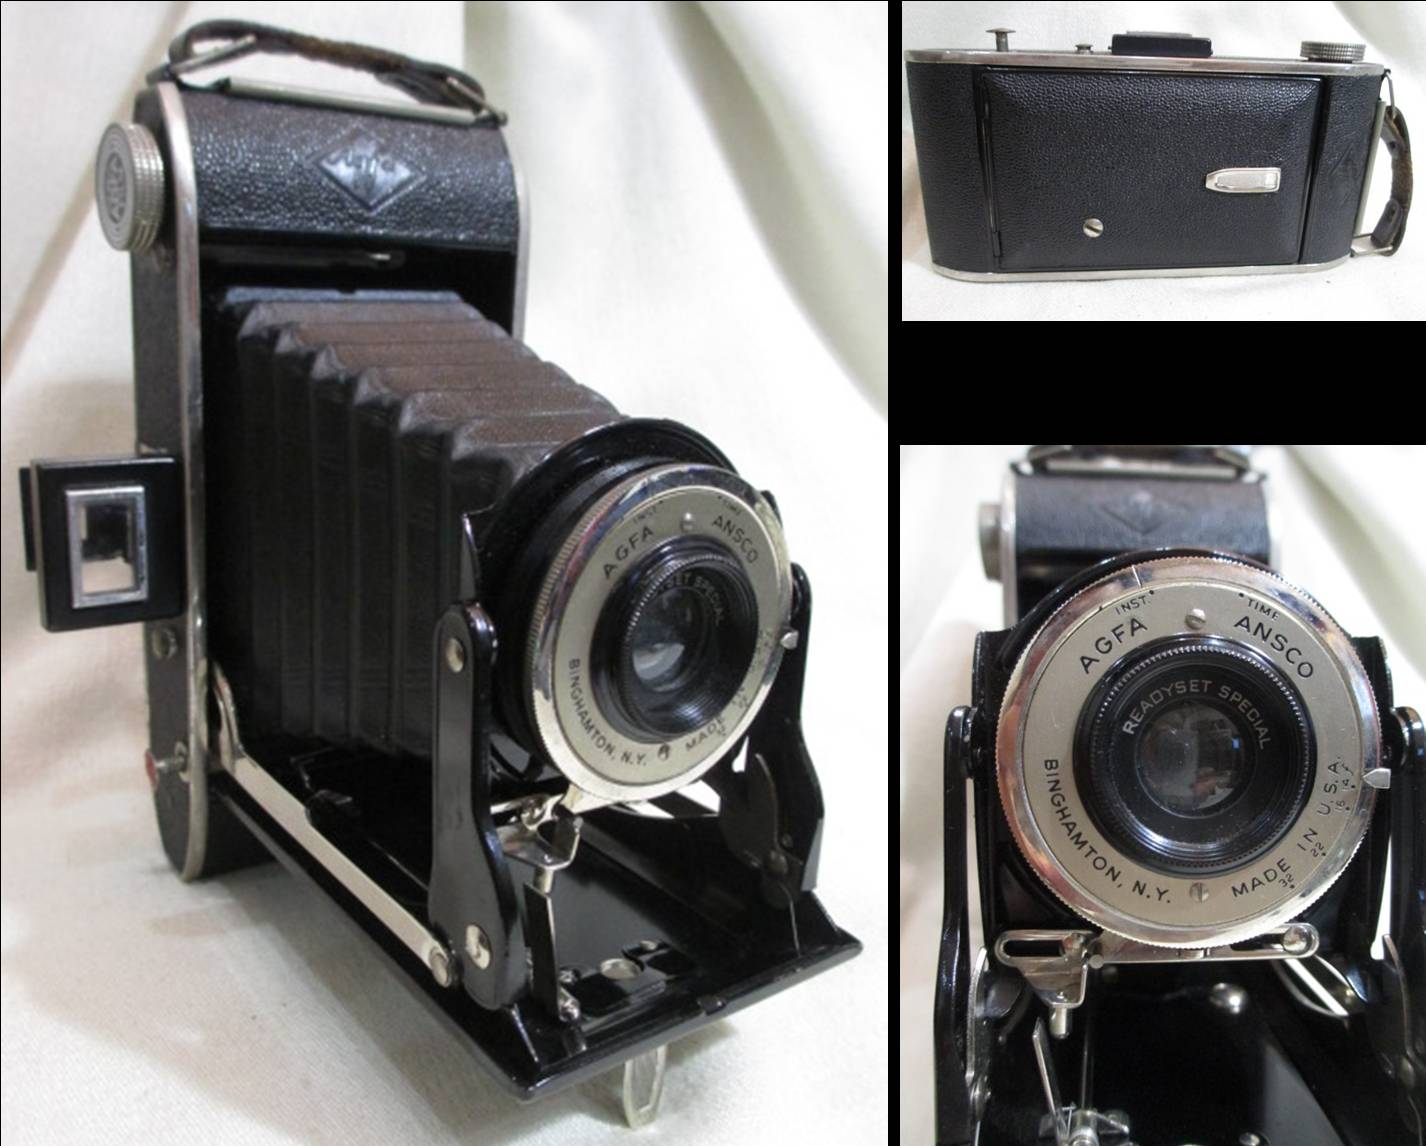 Agfa Anscoのフォールディングカメラ、Readyset Special